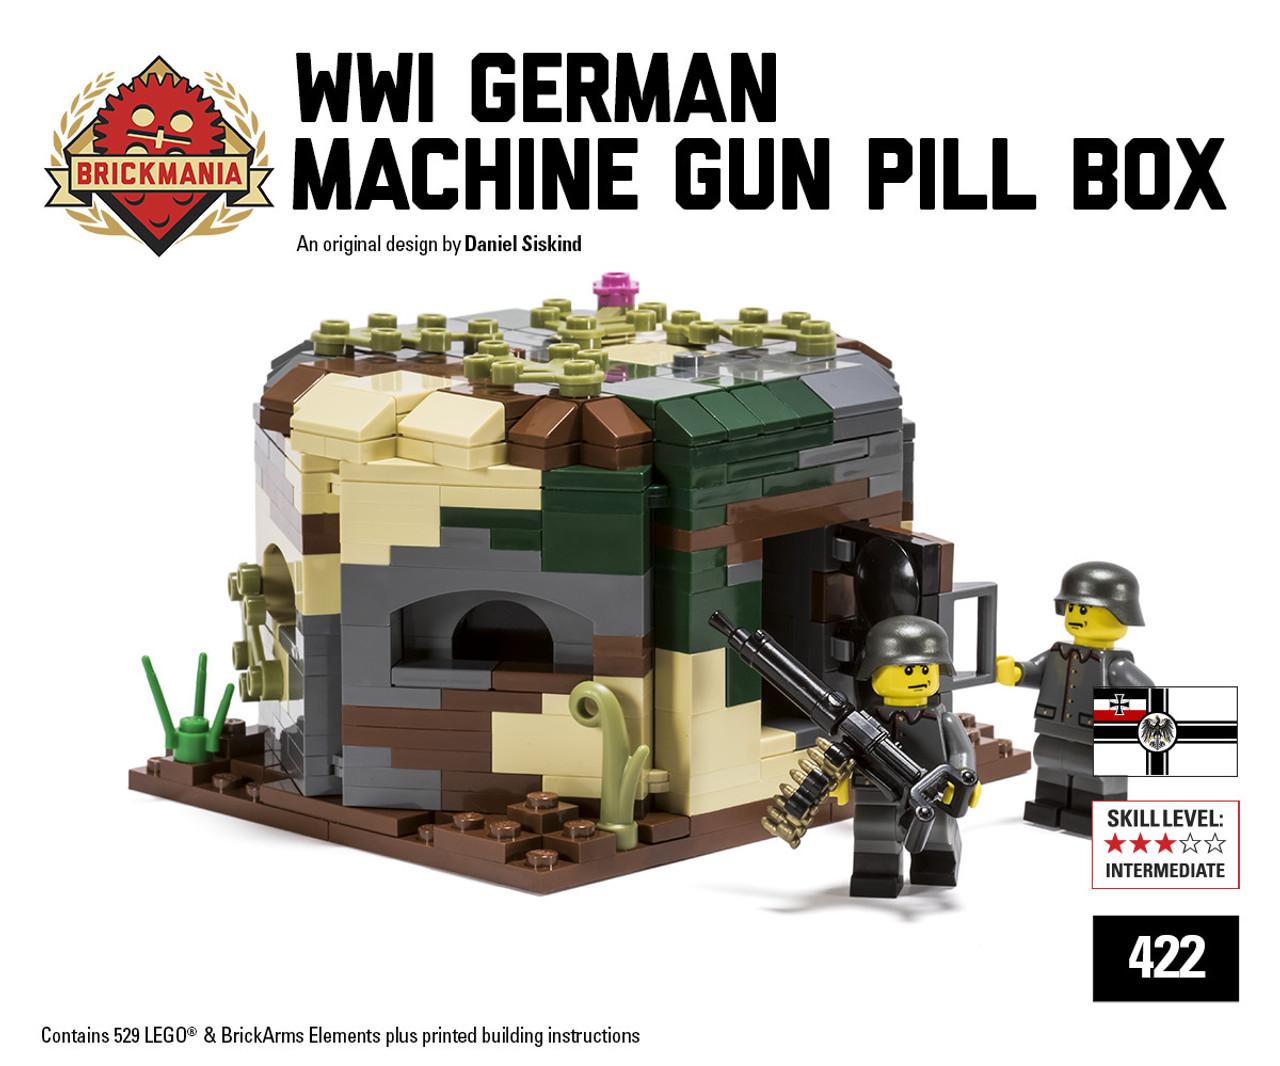 Western Bedroom Tank Toy Box Or: WWI German Machine Gun Pillbox